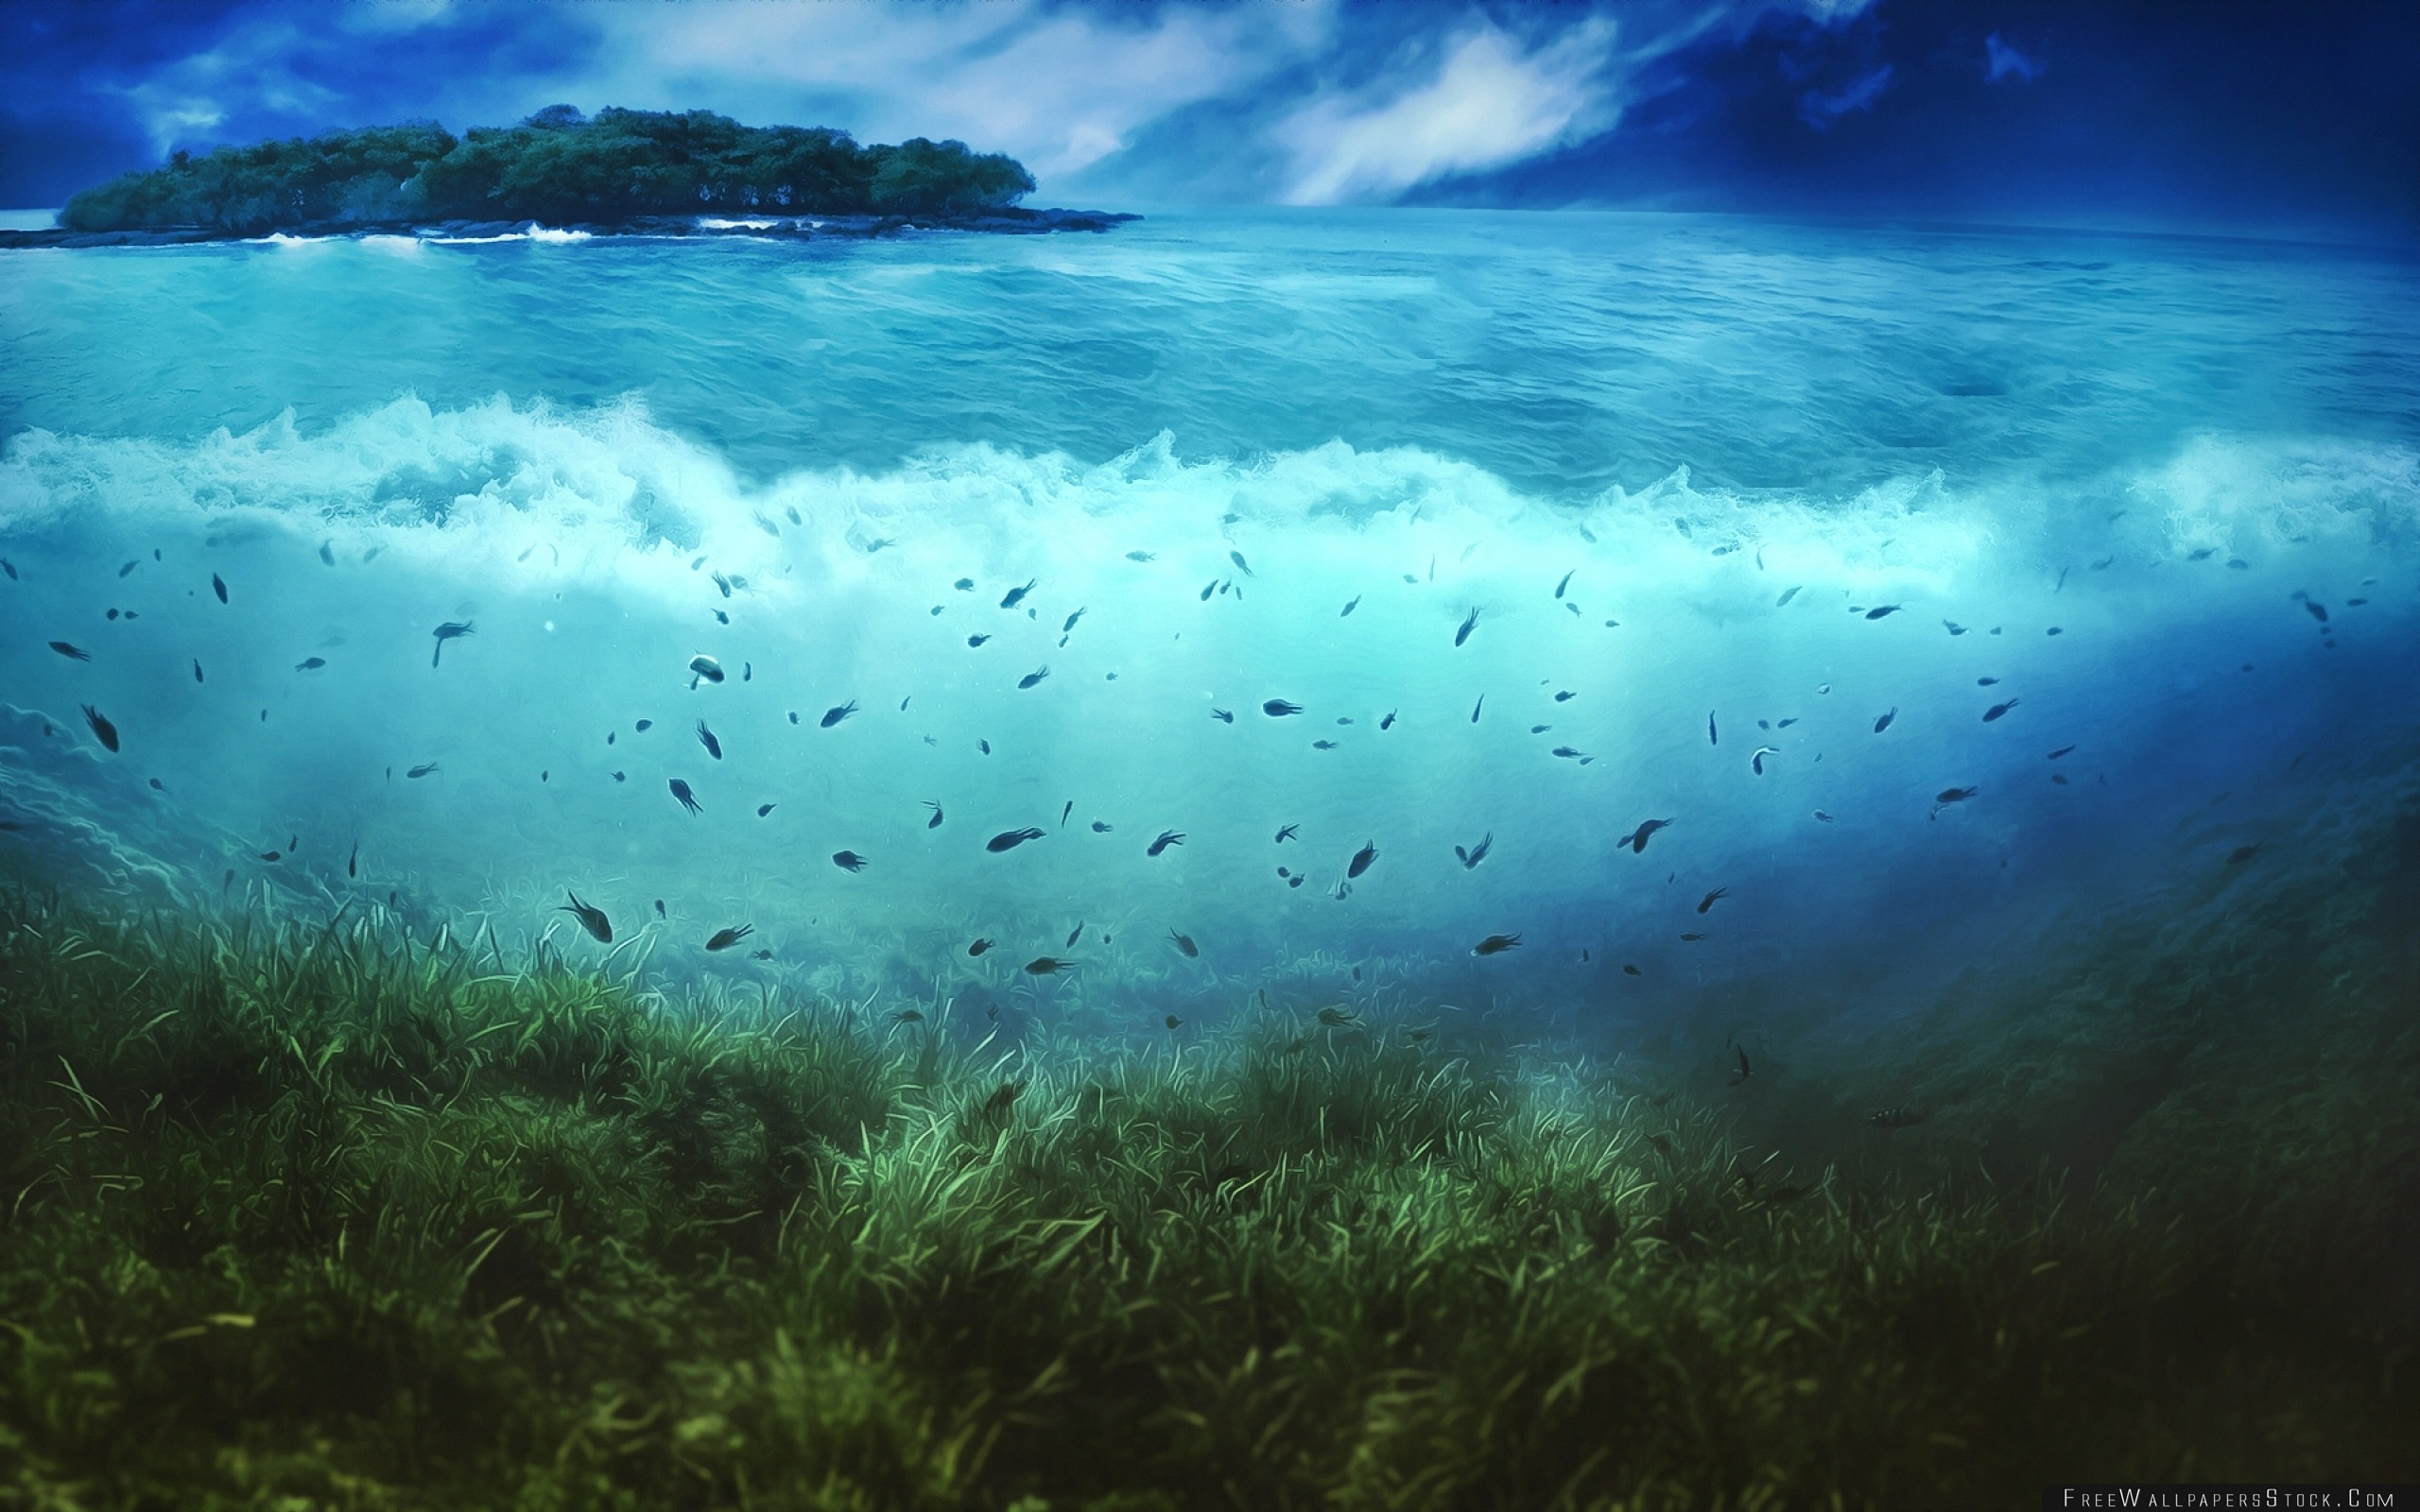 Download Free Wallpaper Water Island Fishes Sea Bottom Vegetation Underwater World Art